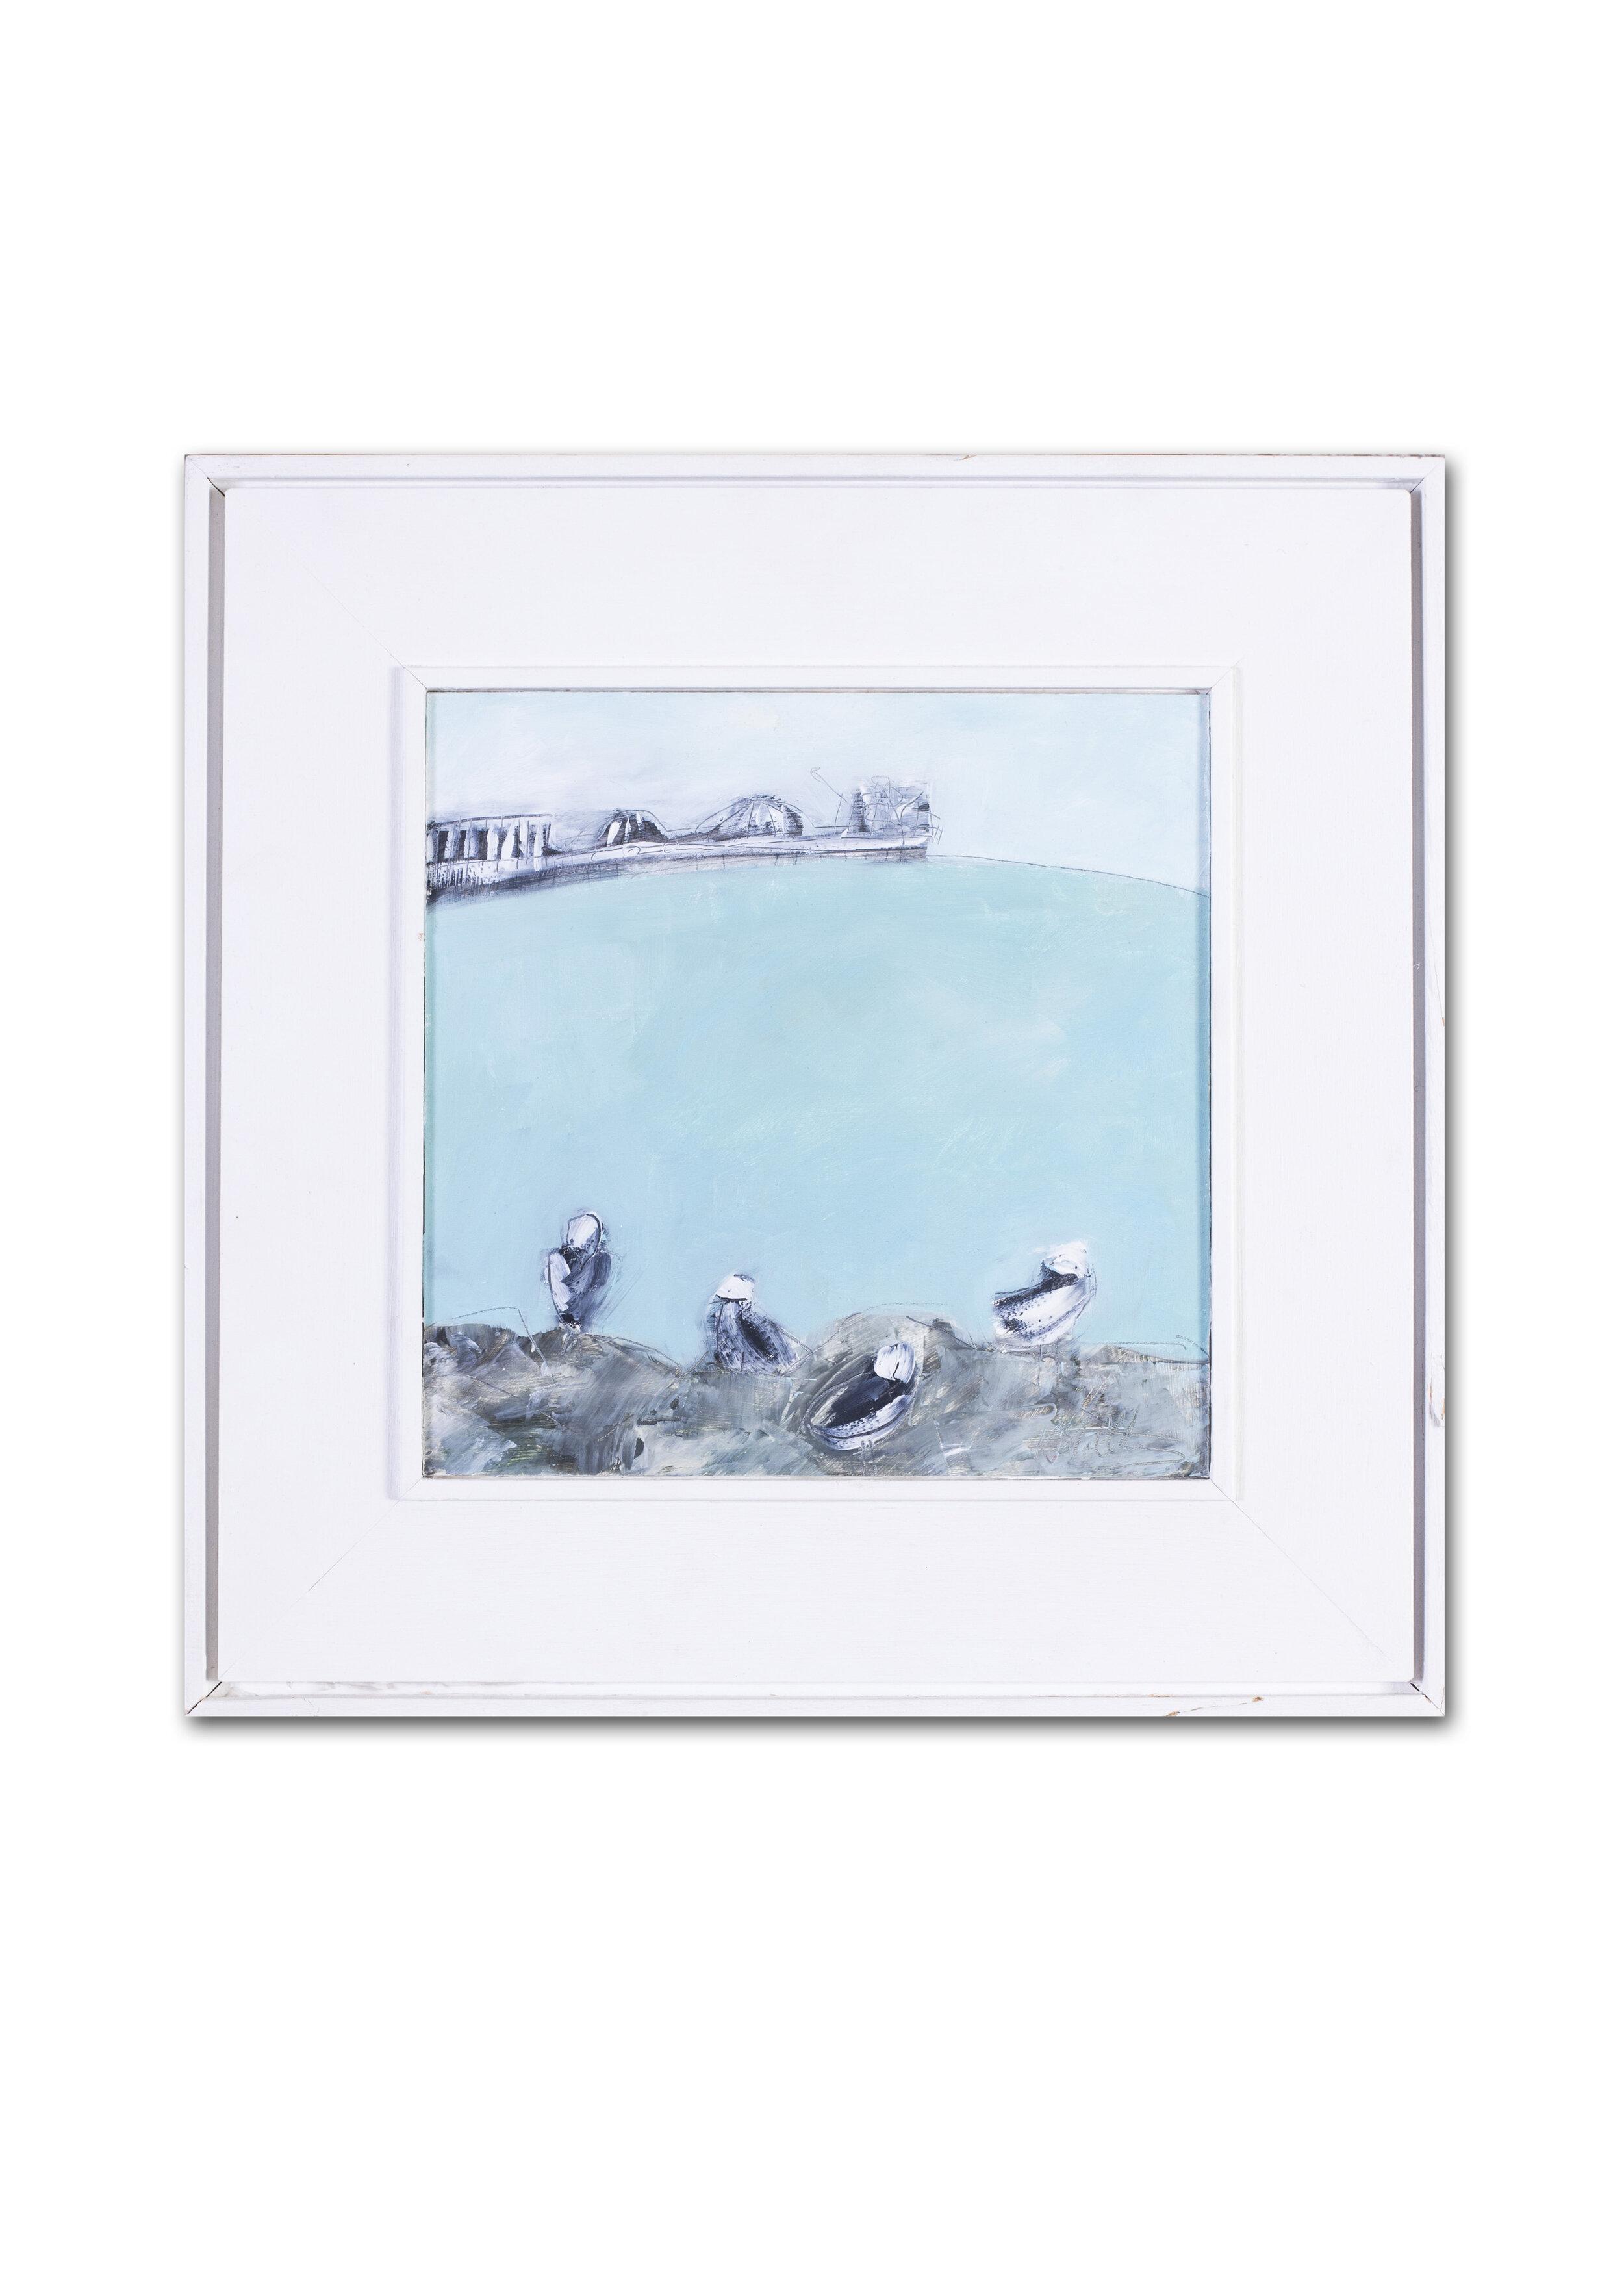 Kathryn Matthews   Seagulls and pier, Brighton, England    Price: £430